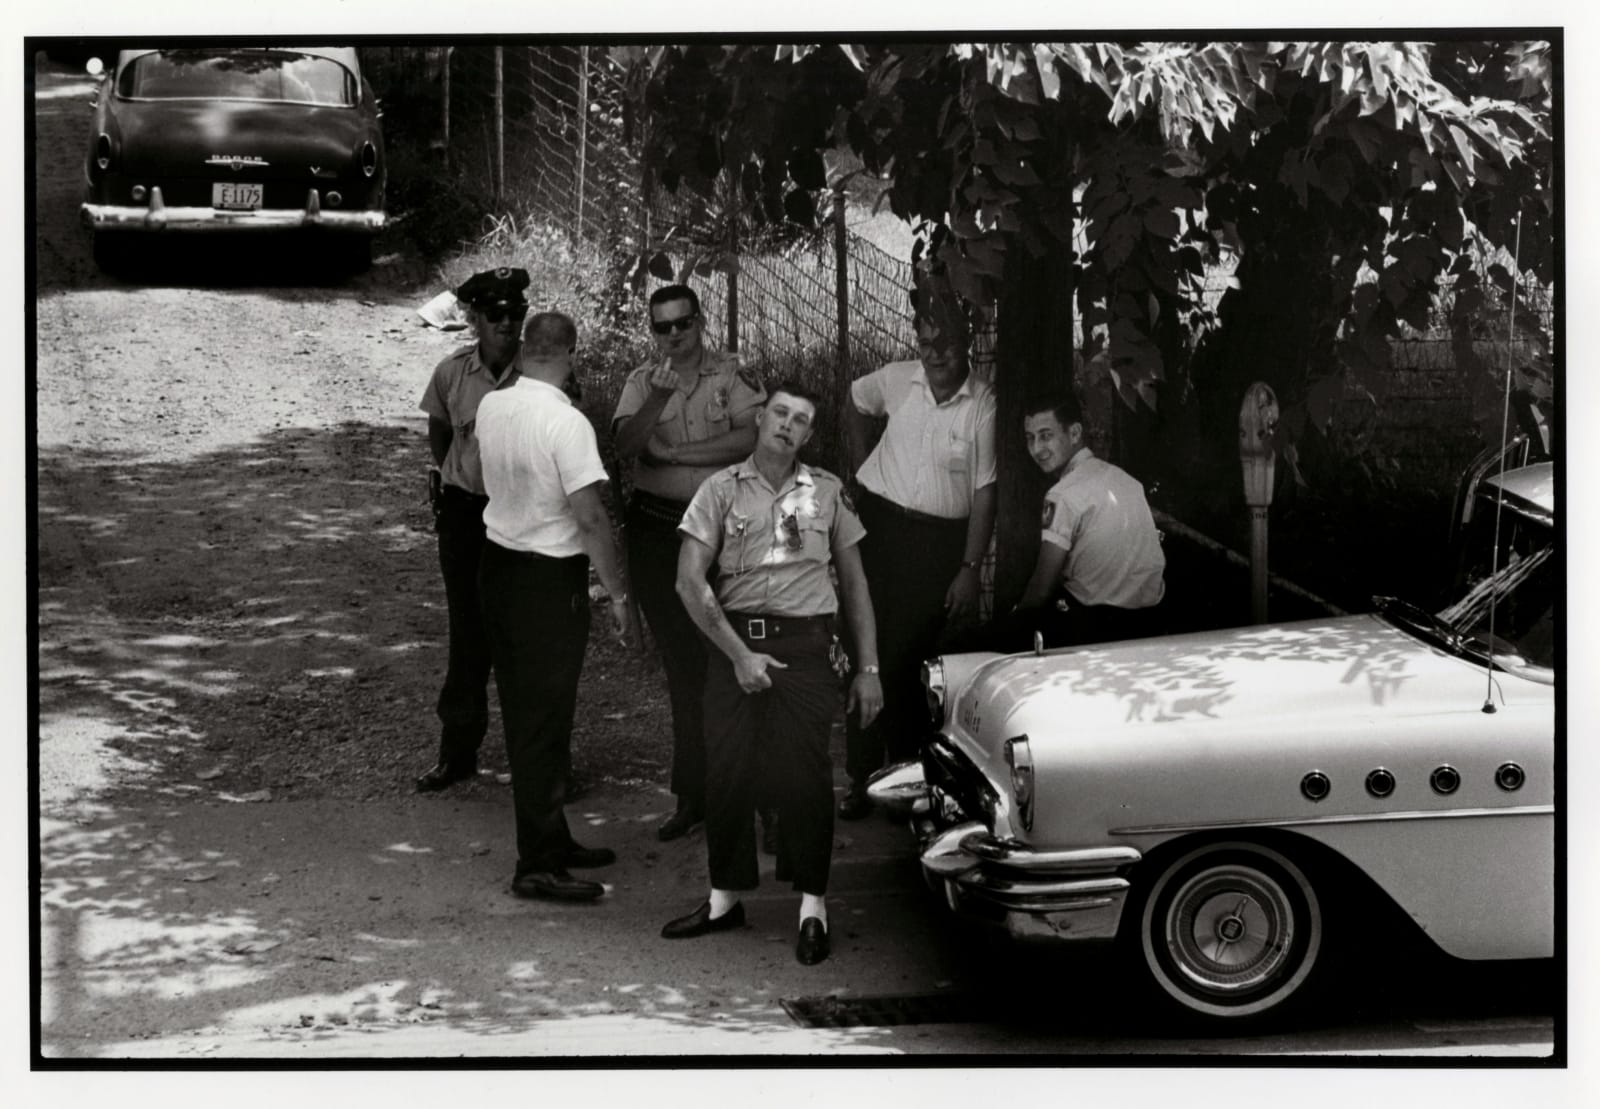 Danny Lyon - Clarksdale Mississippi Police, 1963